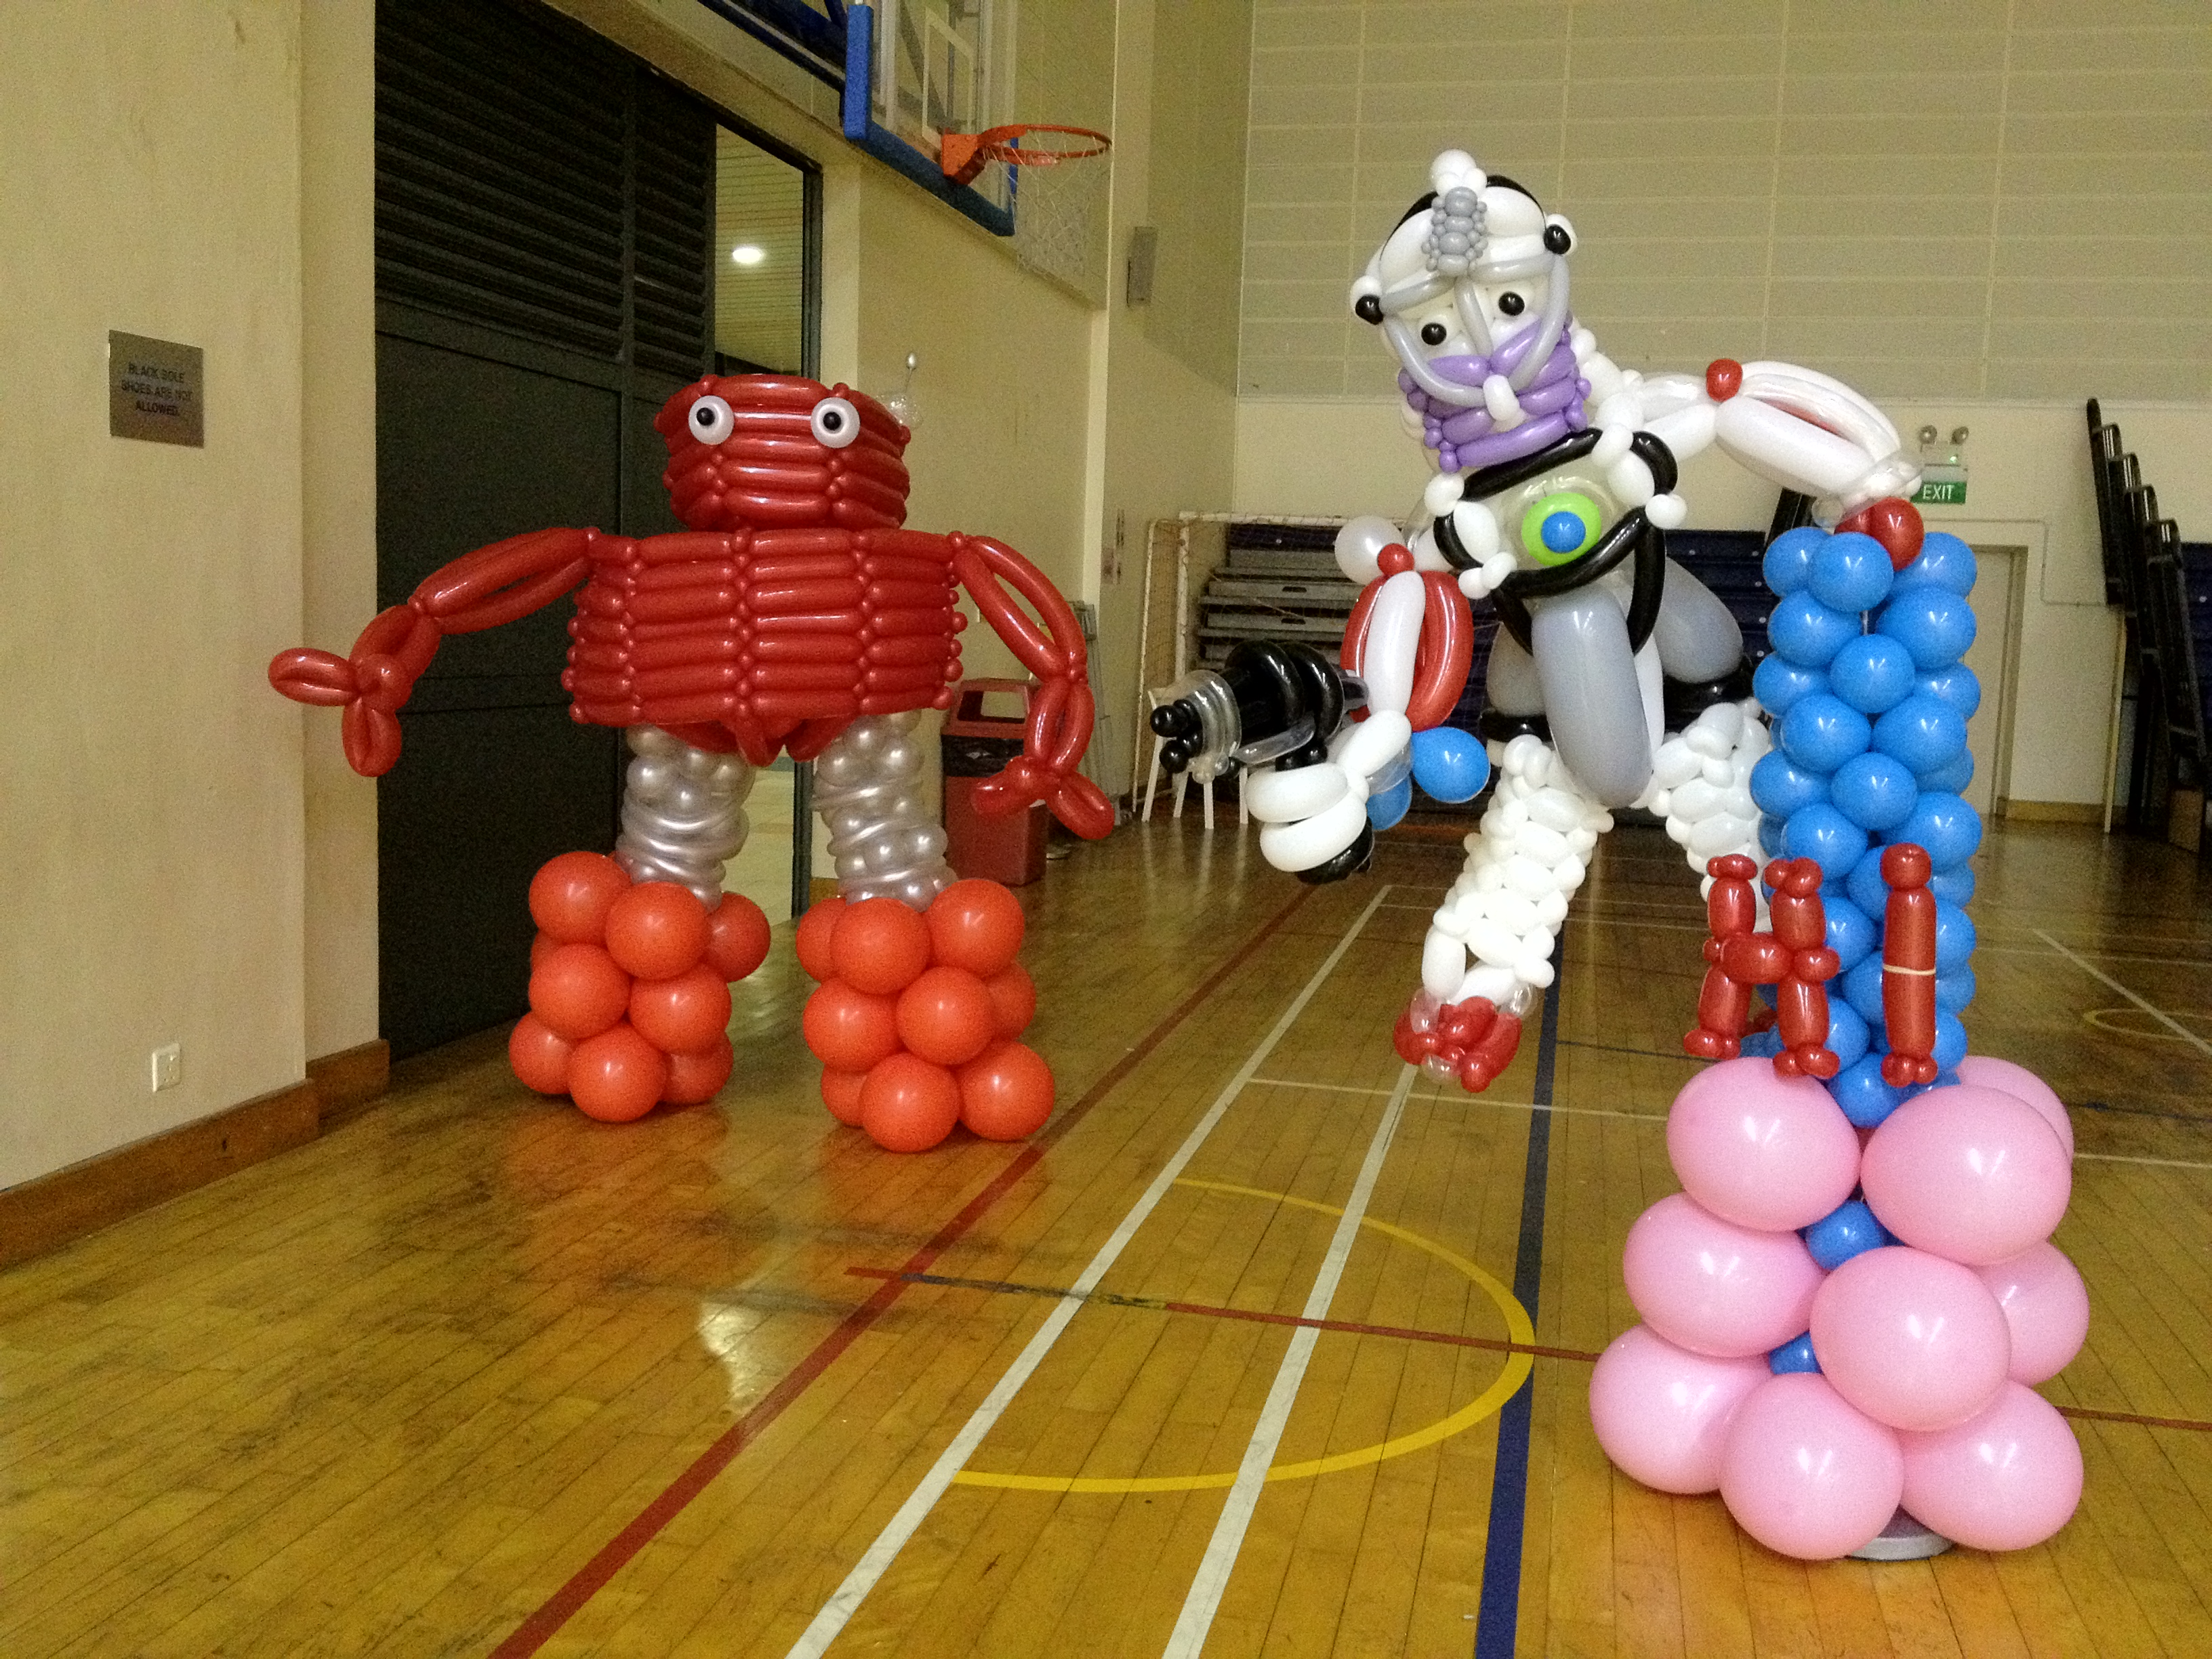 Singapore balloon robot that balloons